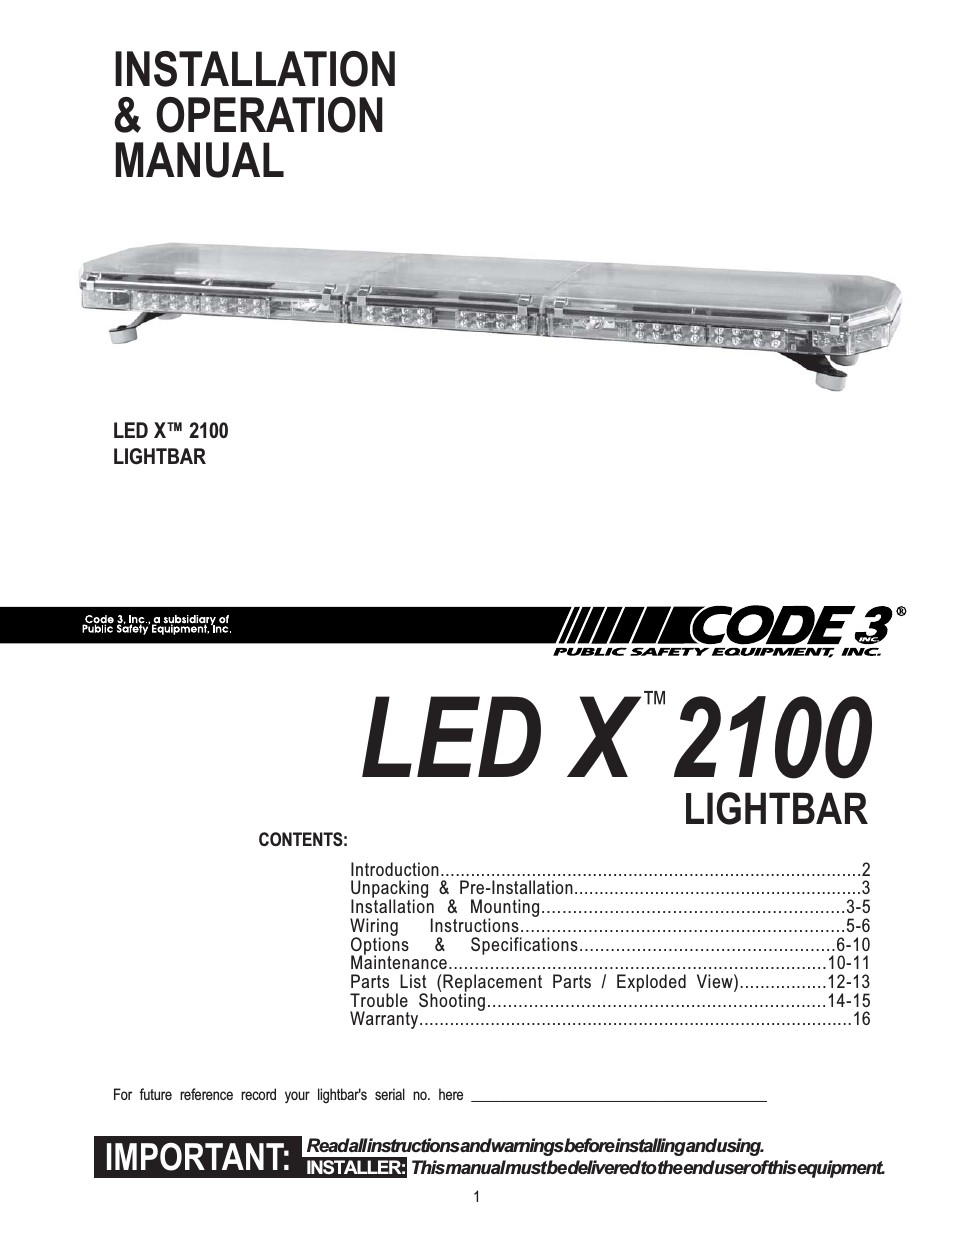 Code 3 3892l6 Siren Wiring Diagram Cobra Car Alarm Wiring Diagram Code 3  MX7000 Bulbs Code 3 Mx7000 Wiring Diagram